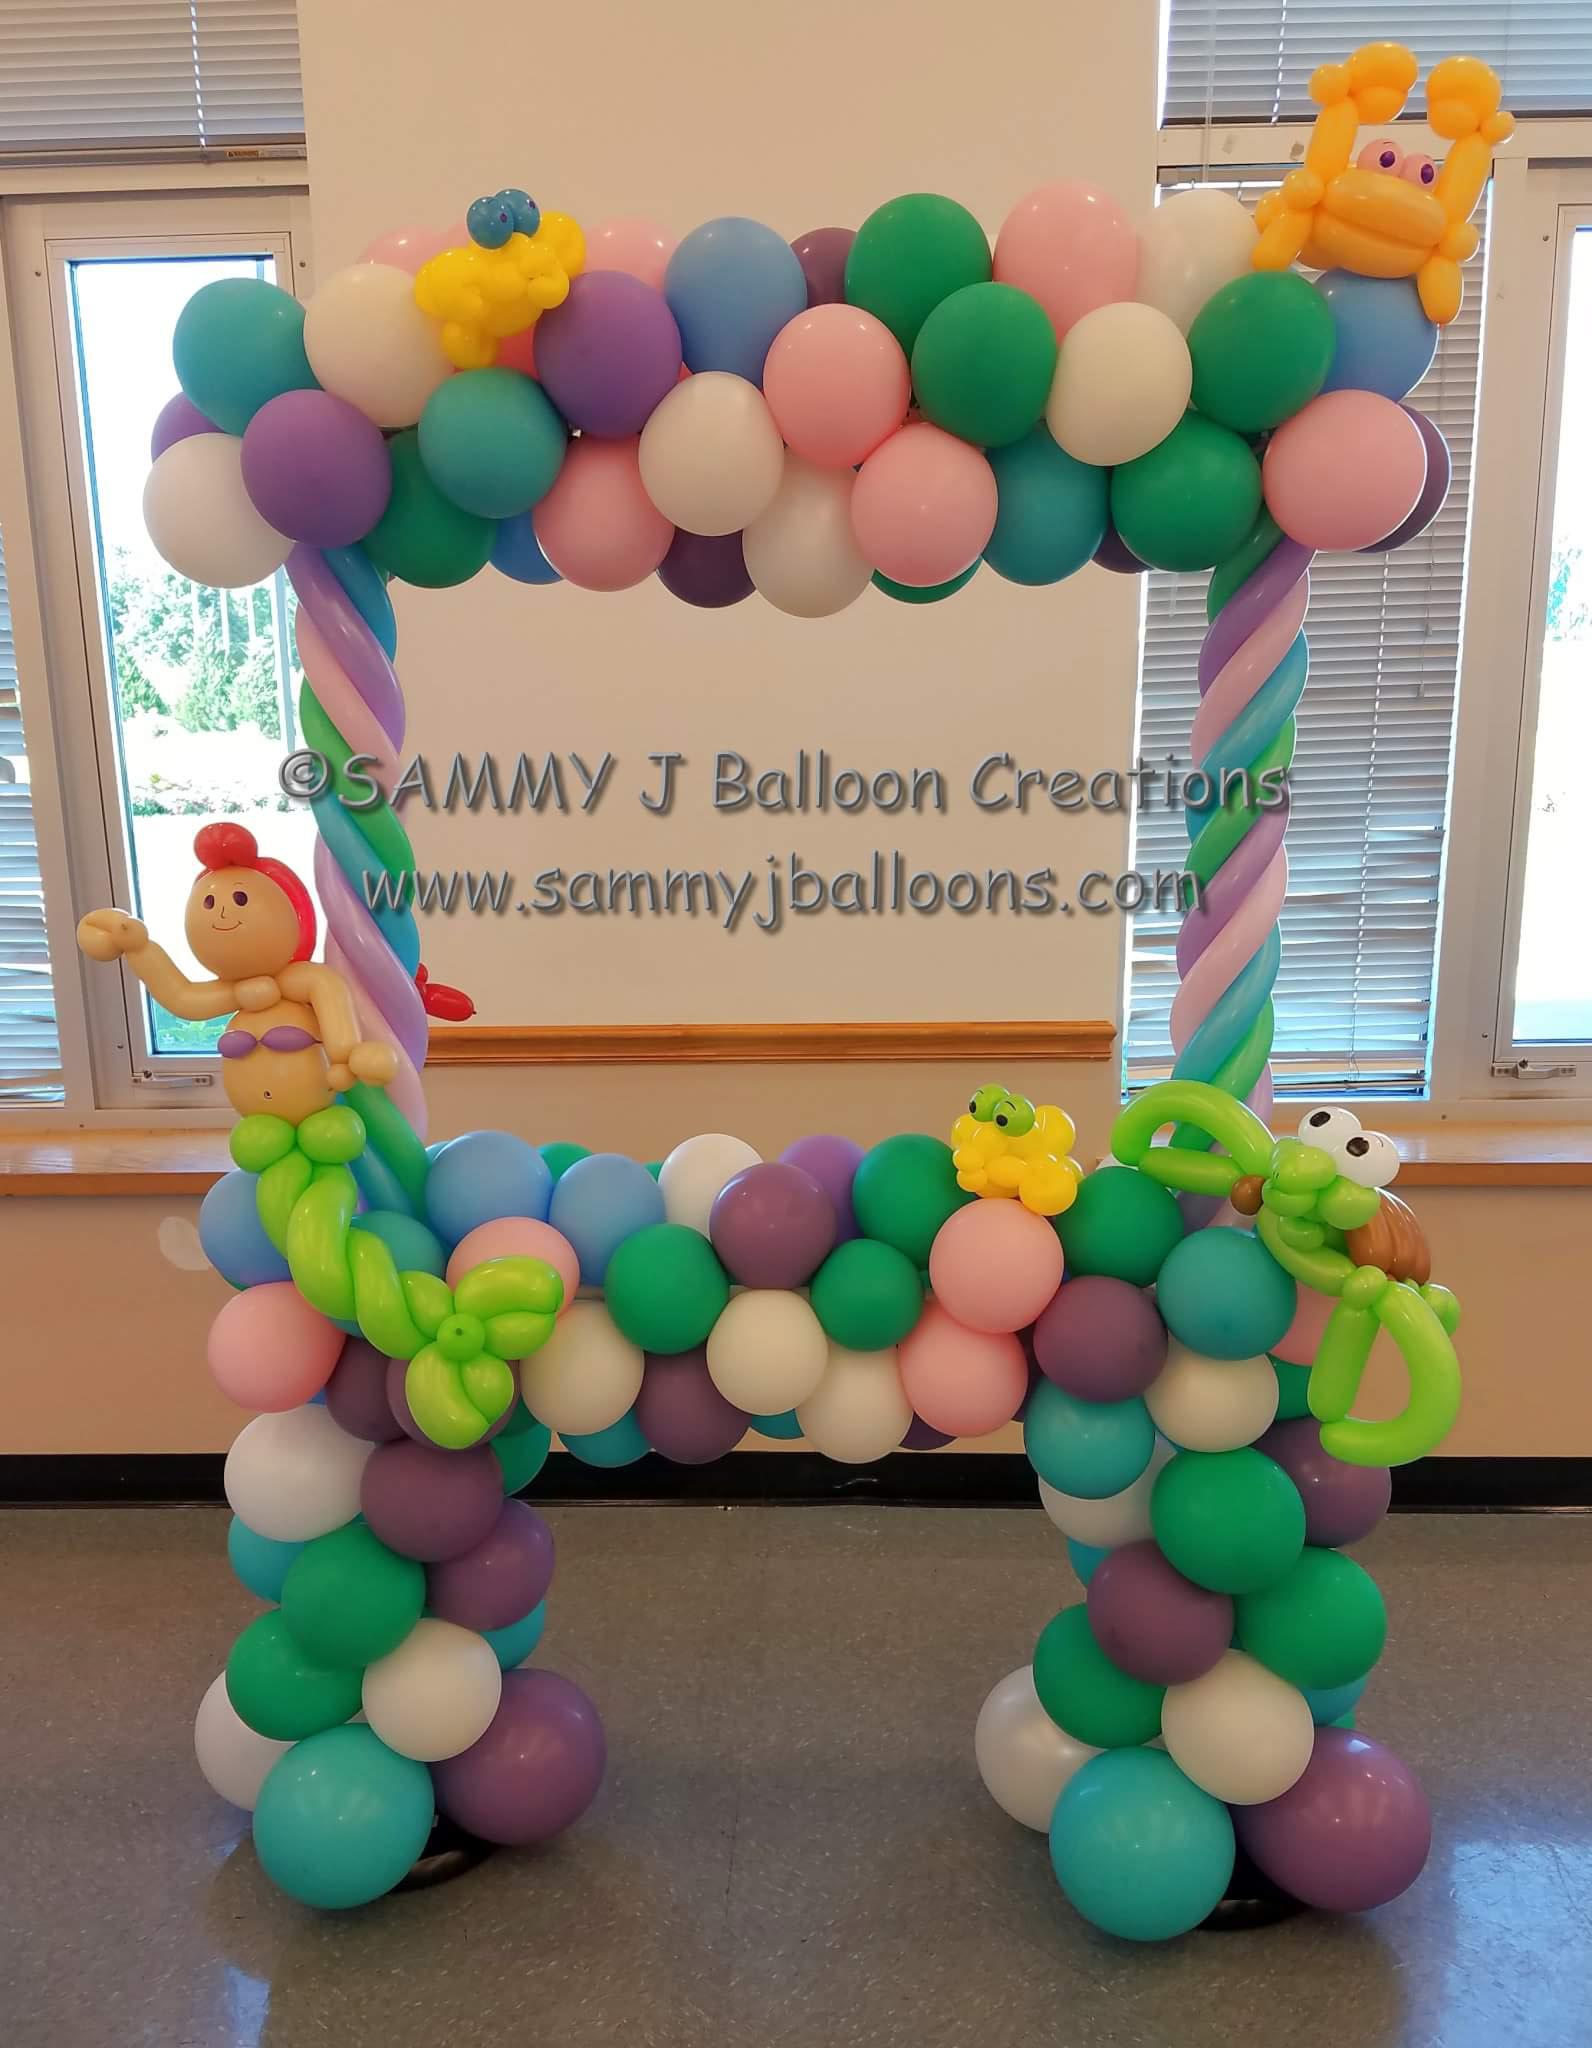 SAMMY J Balloon Creations st louis balloons mermaid photo frame